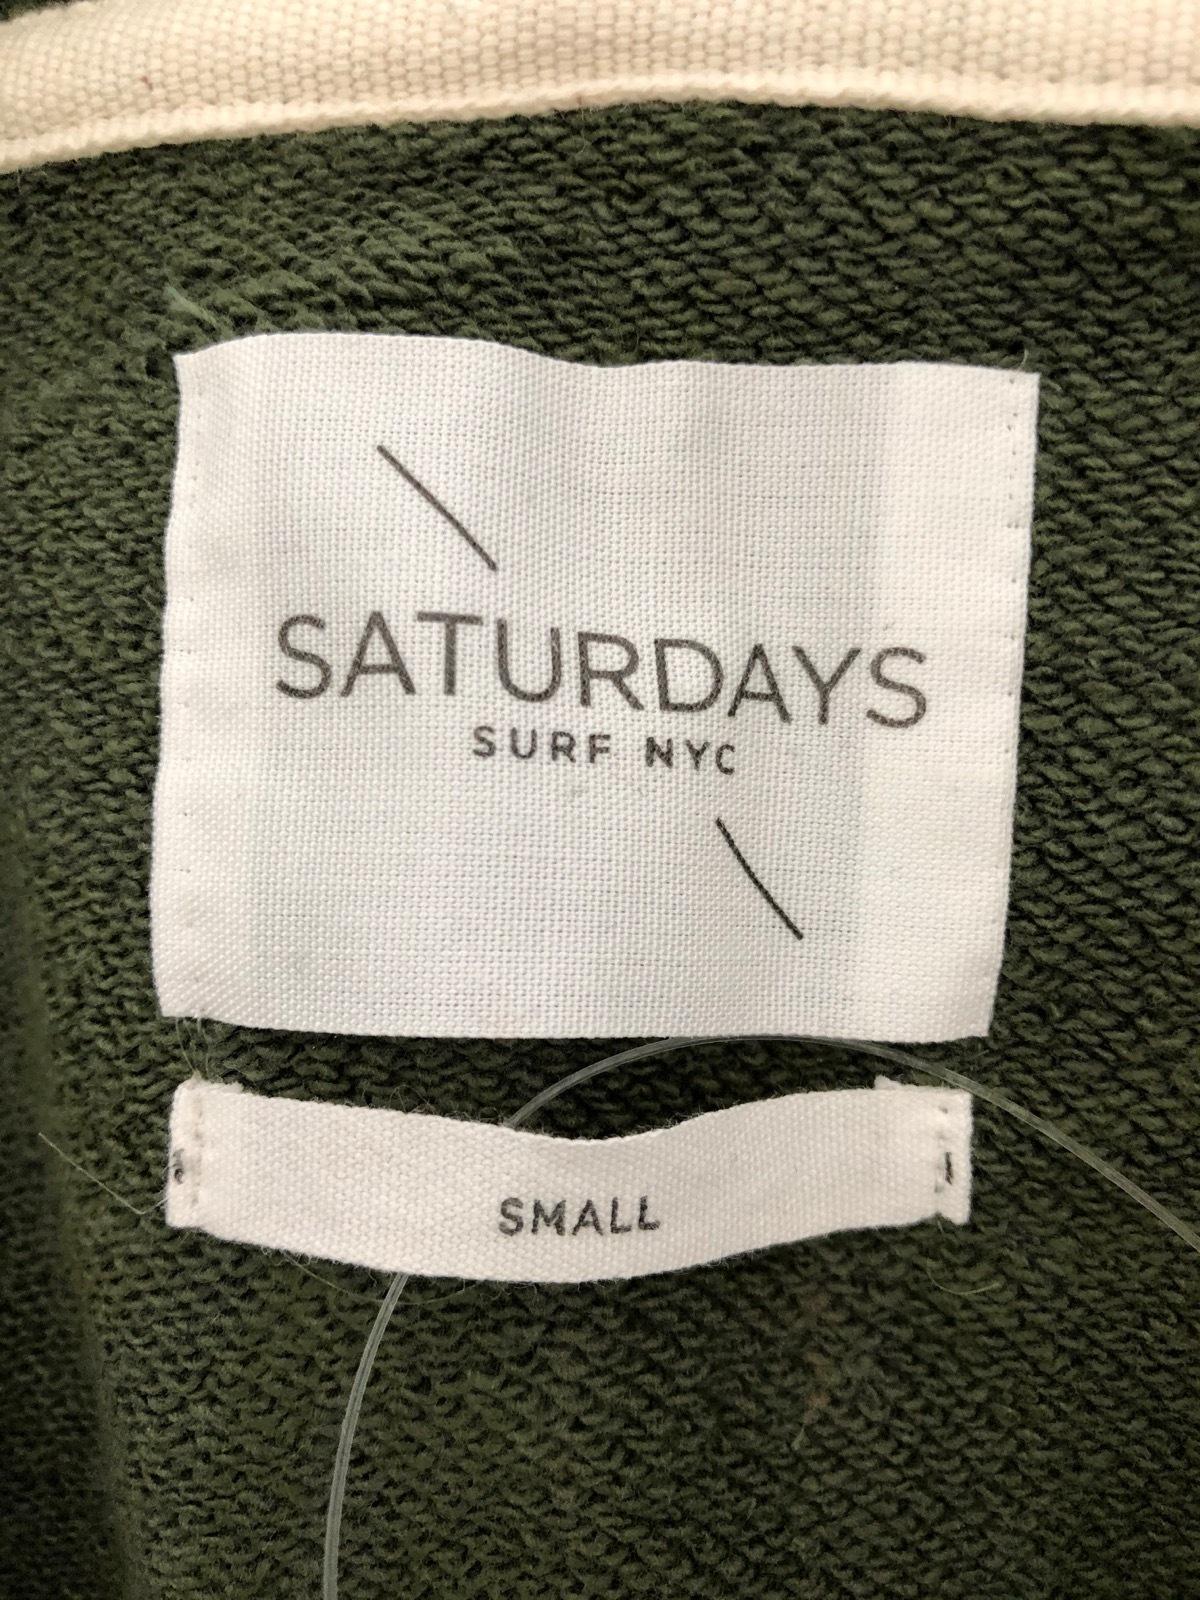 SATURDAYS SURF NYC(サタデーズ サーフ ニューヨーク)のパーカー